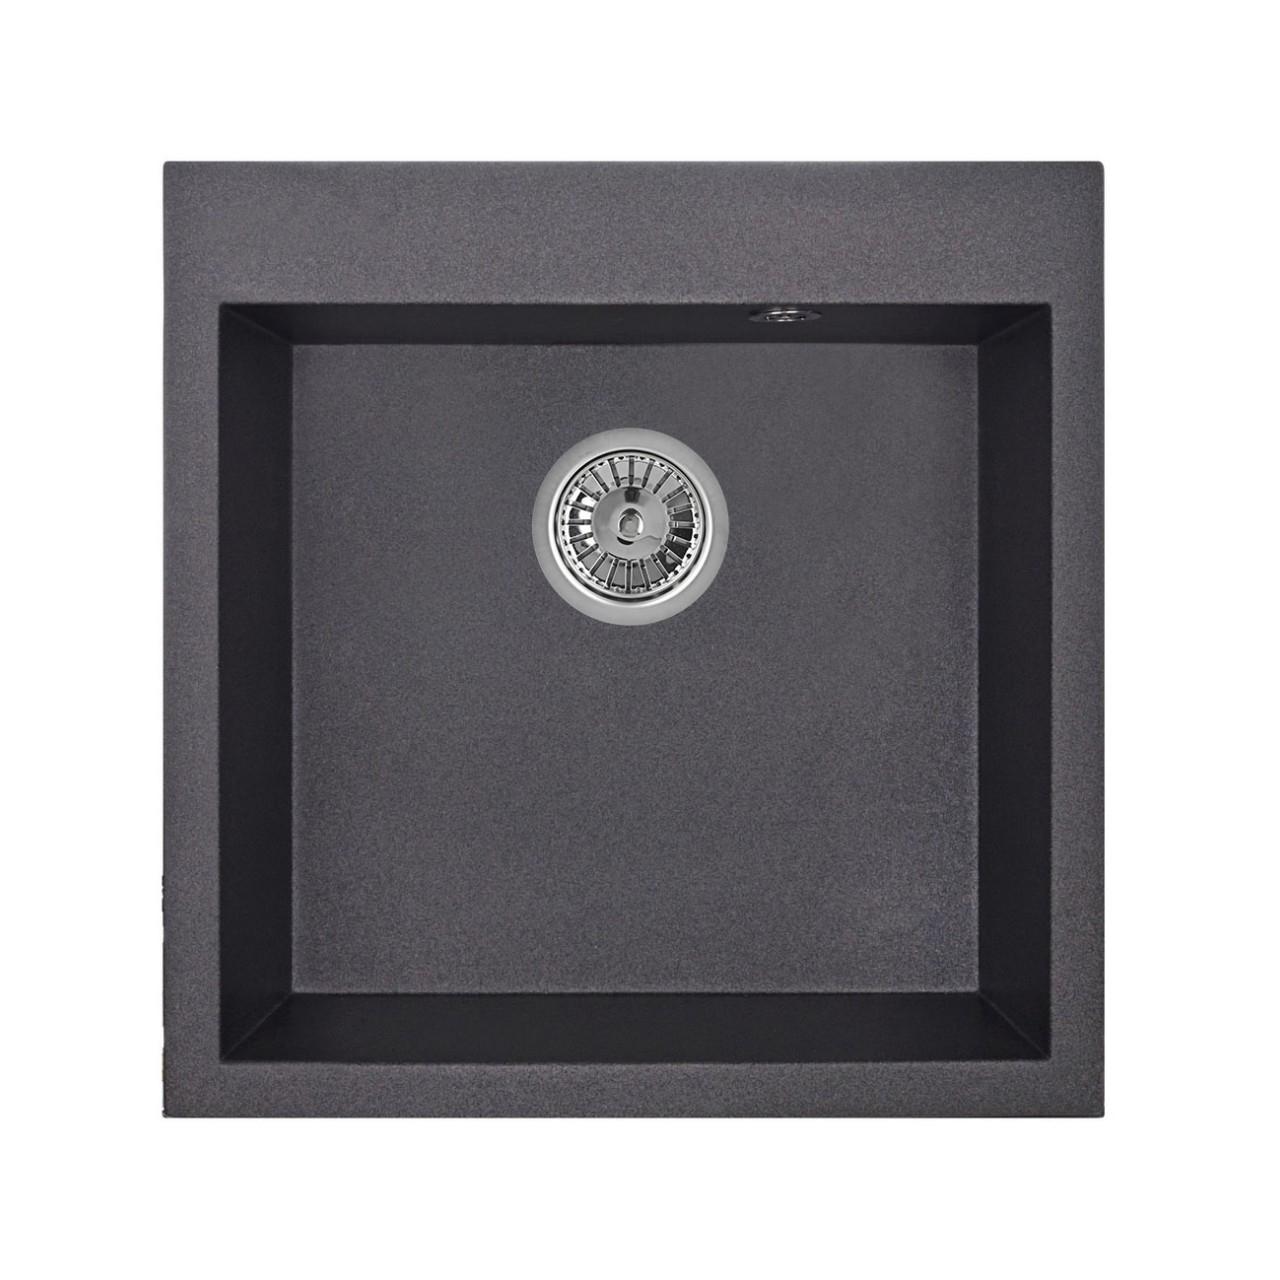 Кухонная мойка Granula GR-5102 505х510 шварц цена